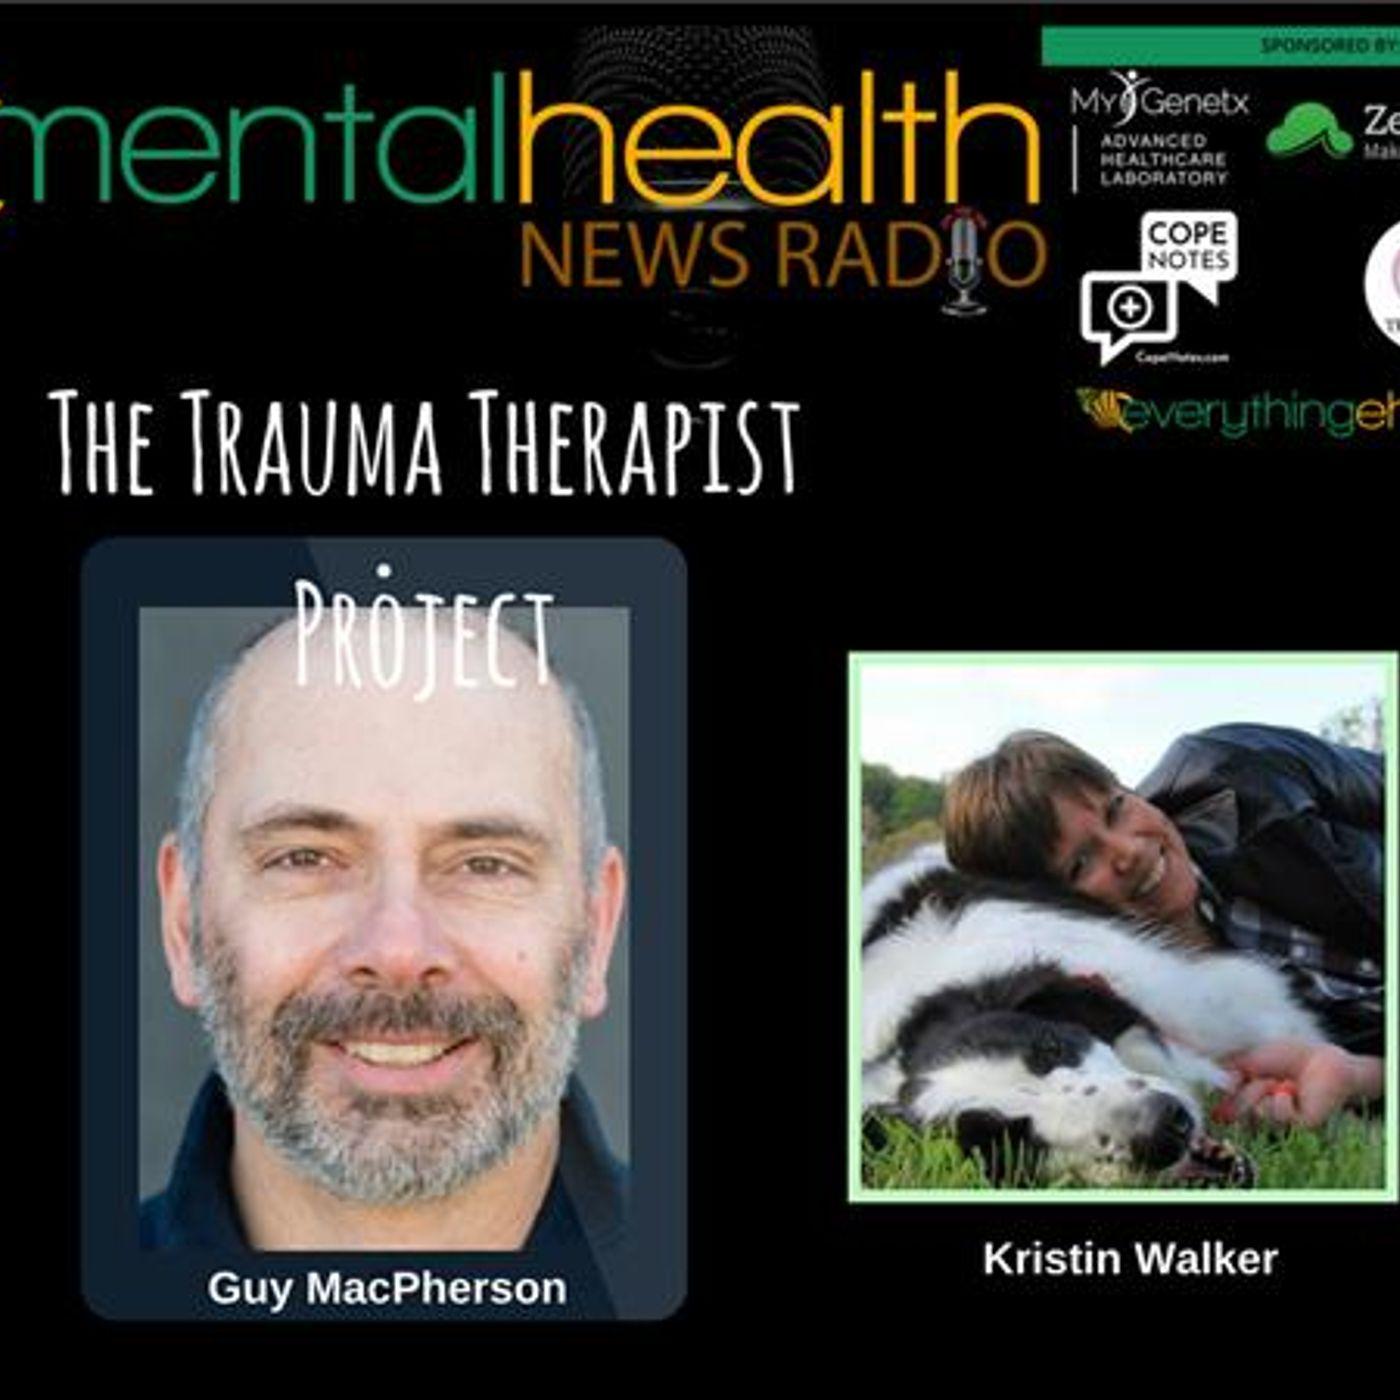 Mental Health News Radio - The Trauma Therapist Project with Guy Macpherson, PhD